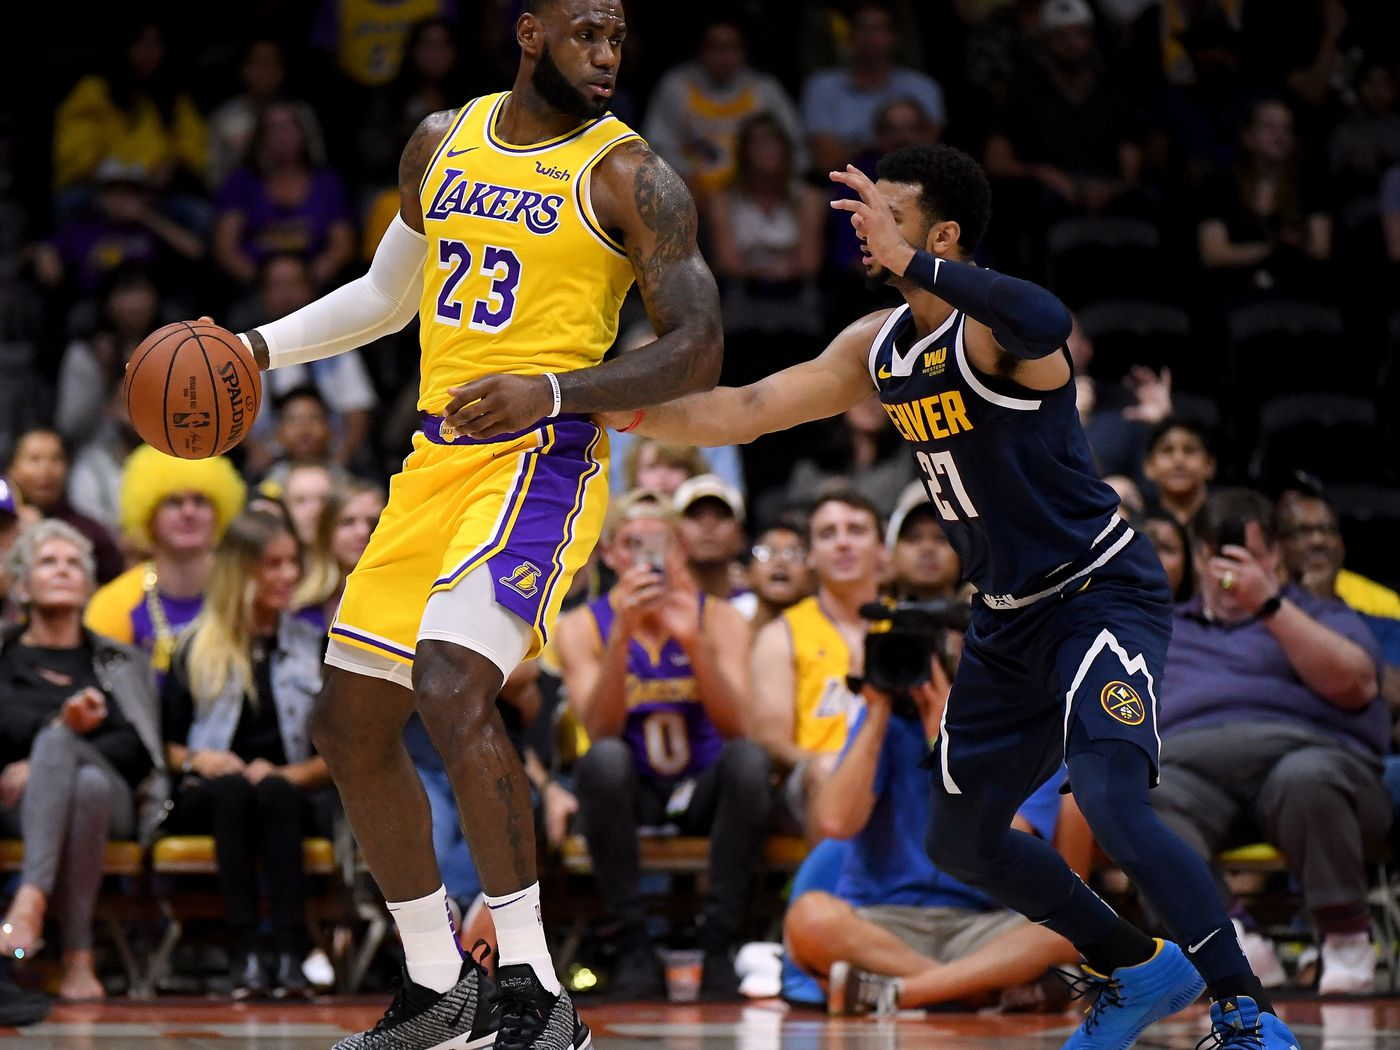 62e79f80c438 Lakers vs. Nuggets Final Score  Hot shooting Nuggets spoil LeBron ...